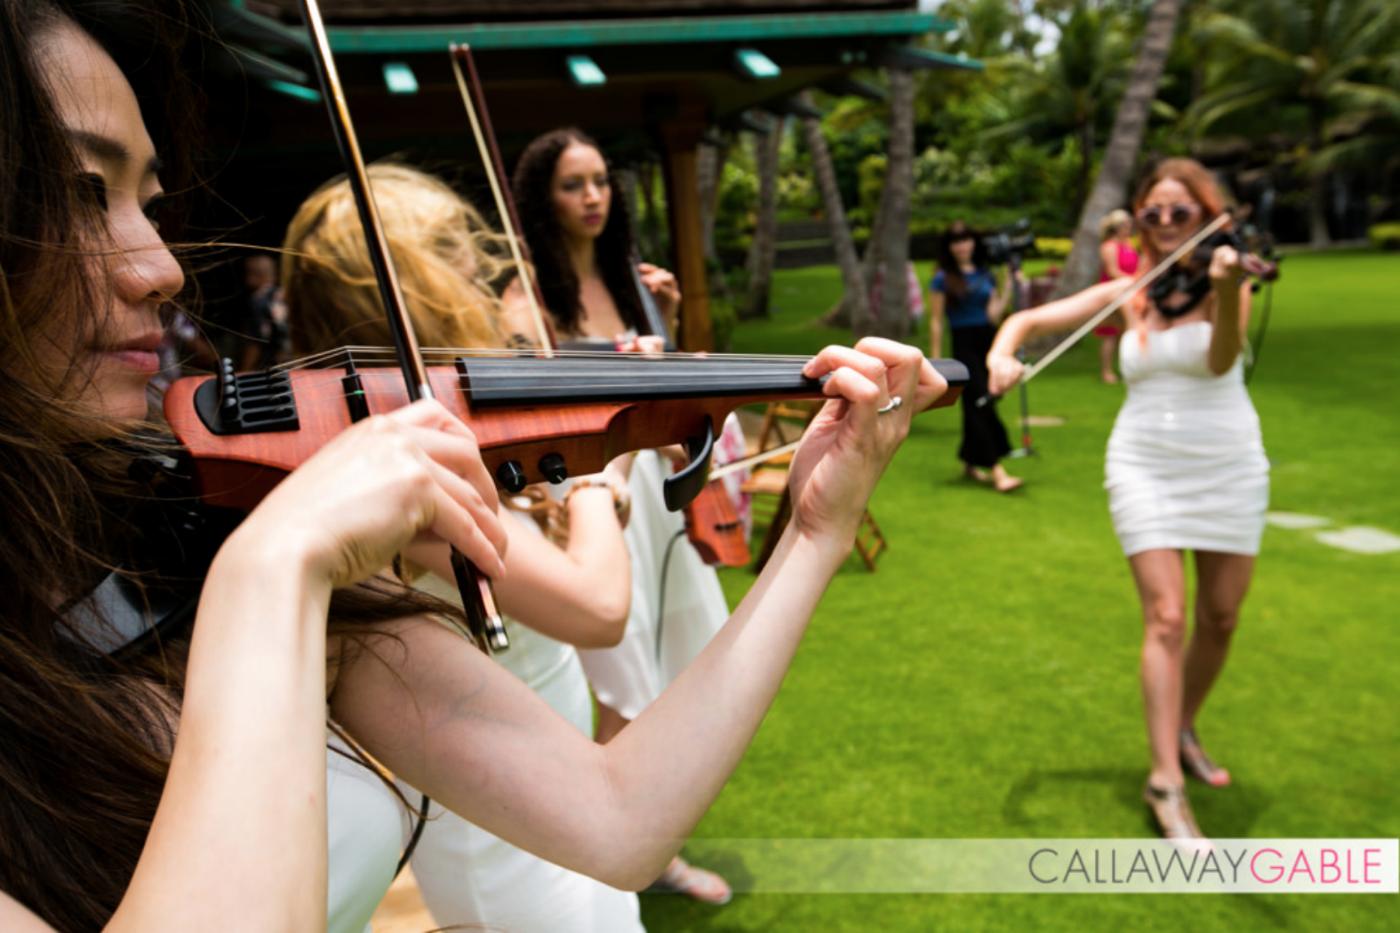 los-angeles-wedding-music-live-event-electric-violinist-string-quartet-DJ-maui-edm-2.png